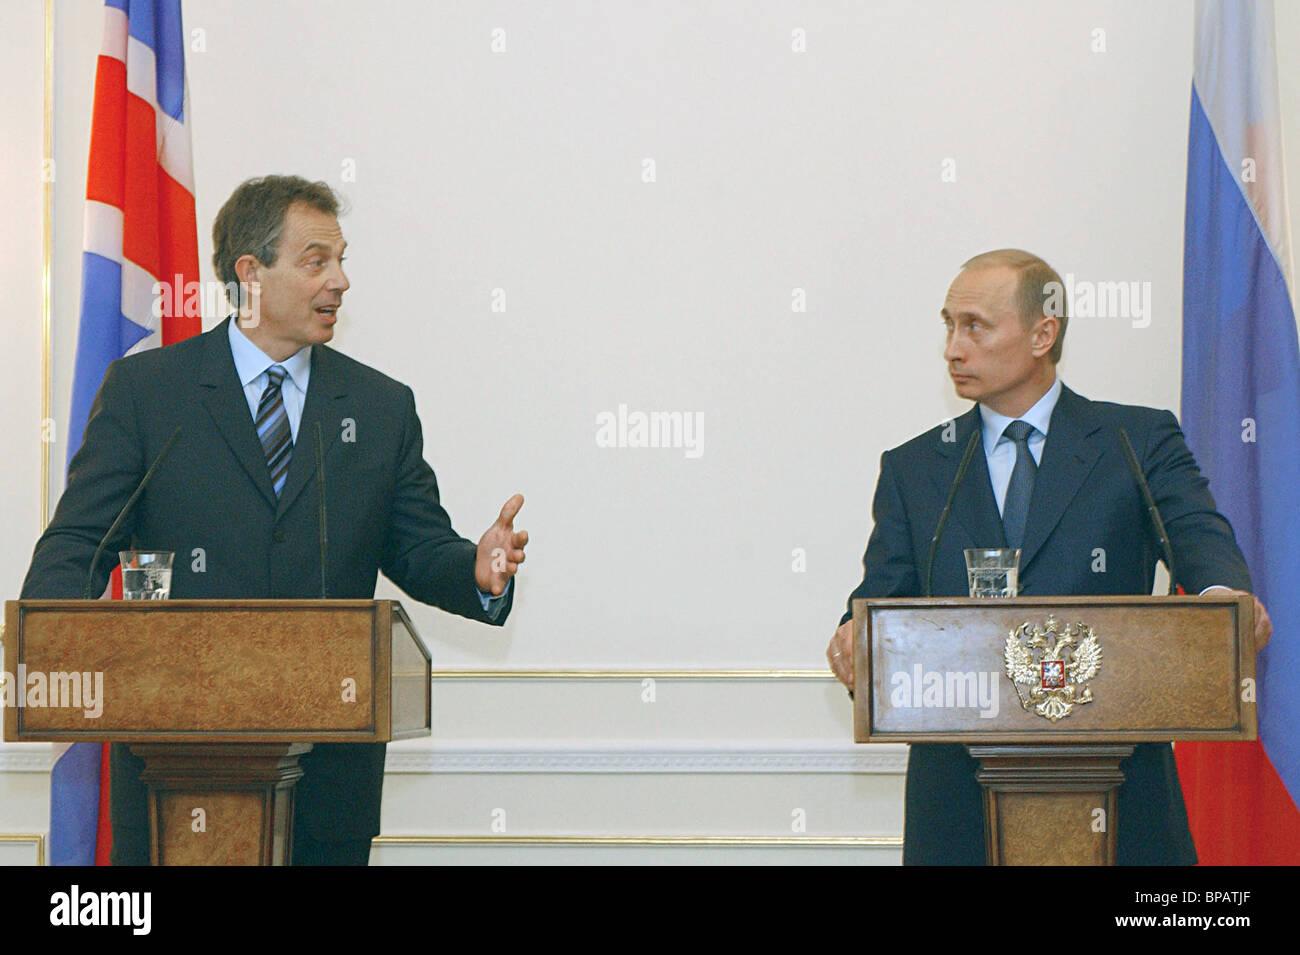 Vladimir Putin, Tony Blair hold press conference - Stock Image